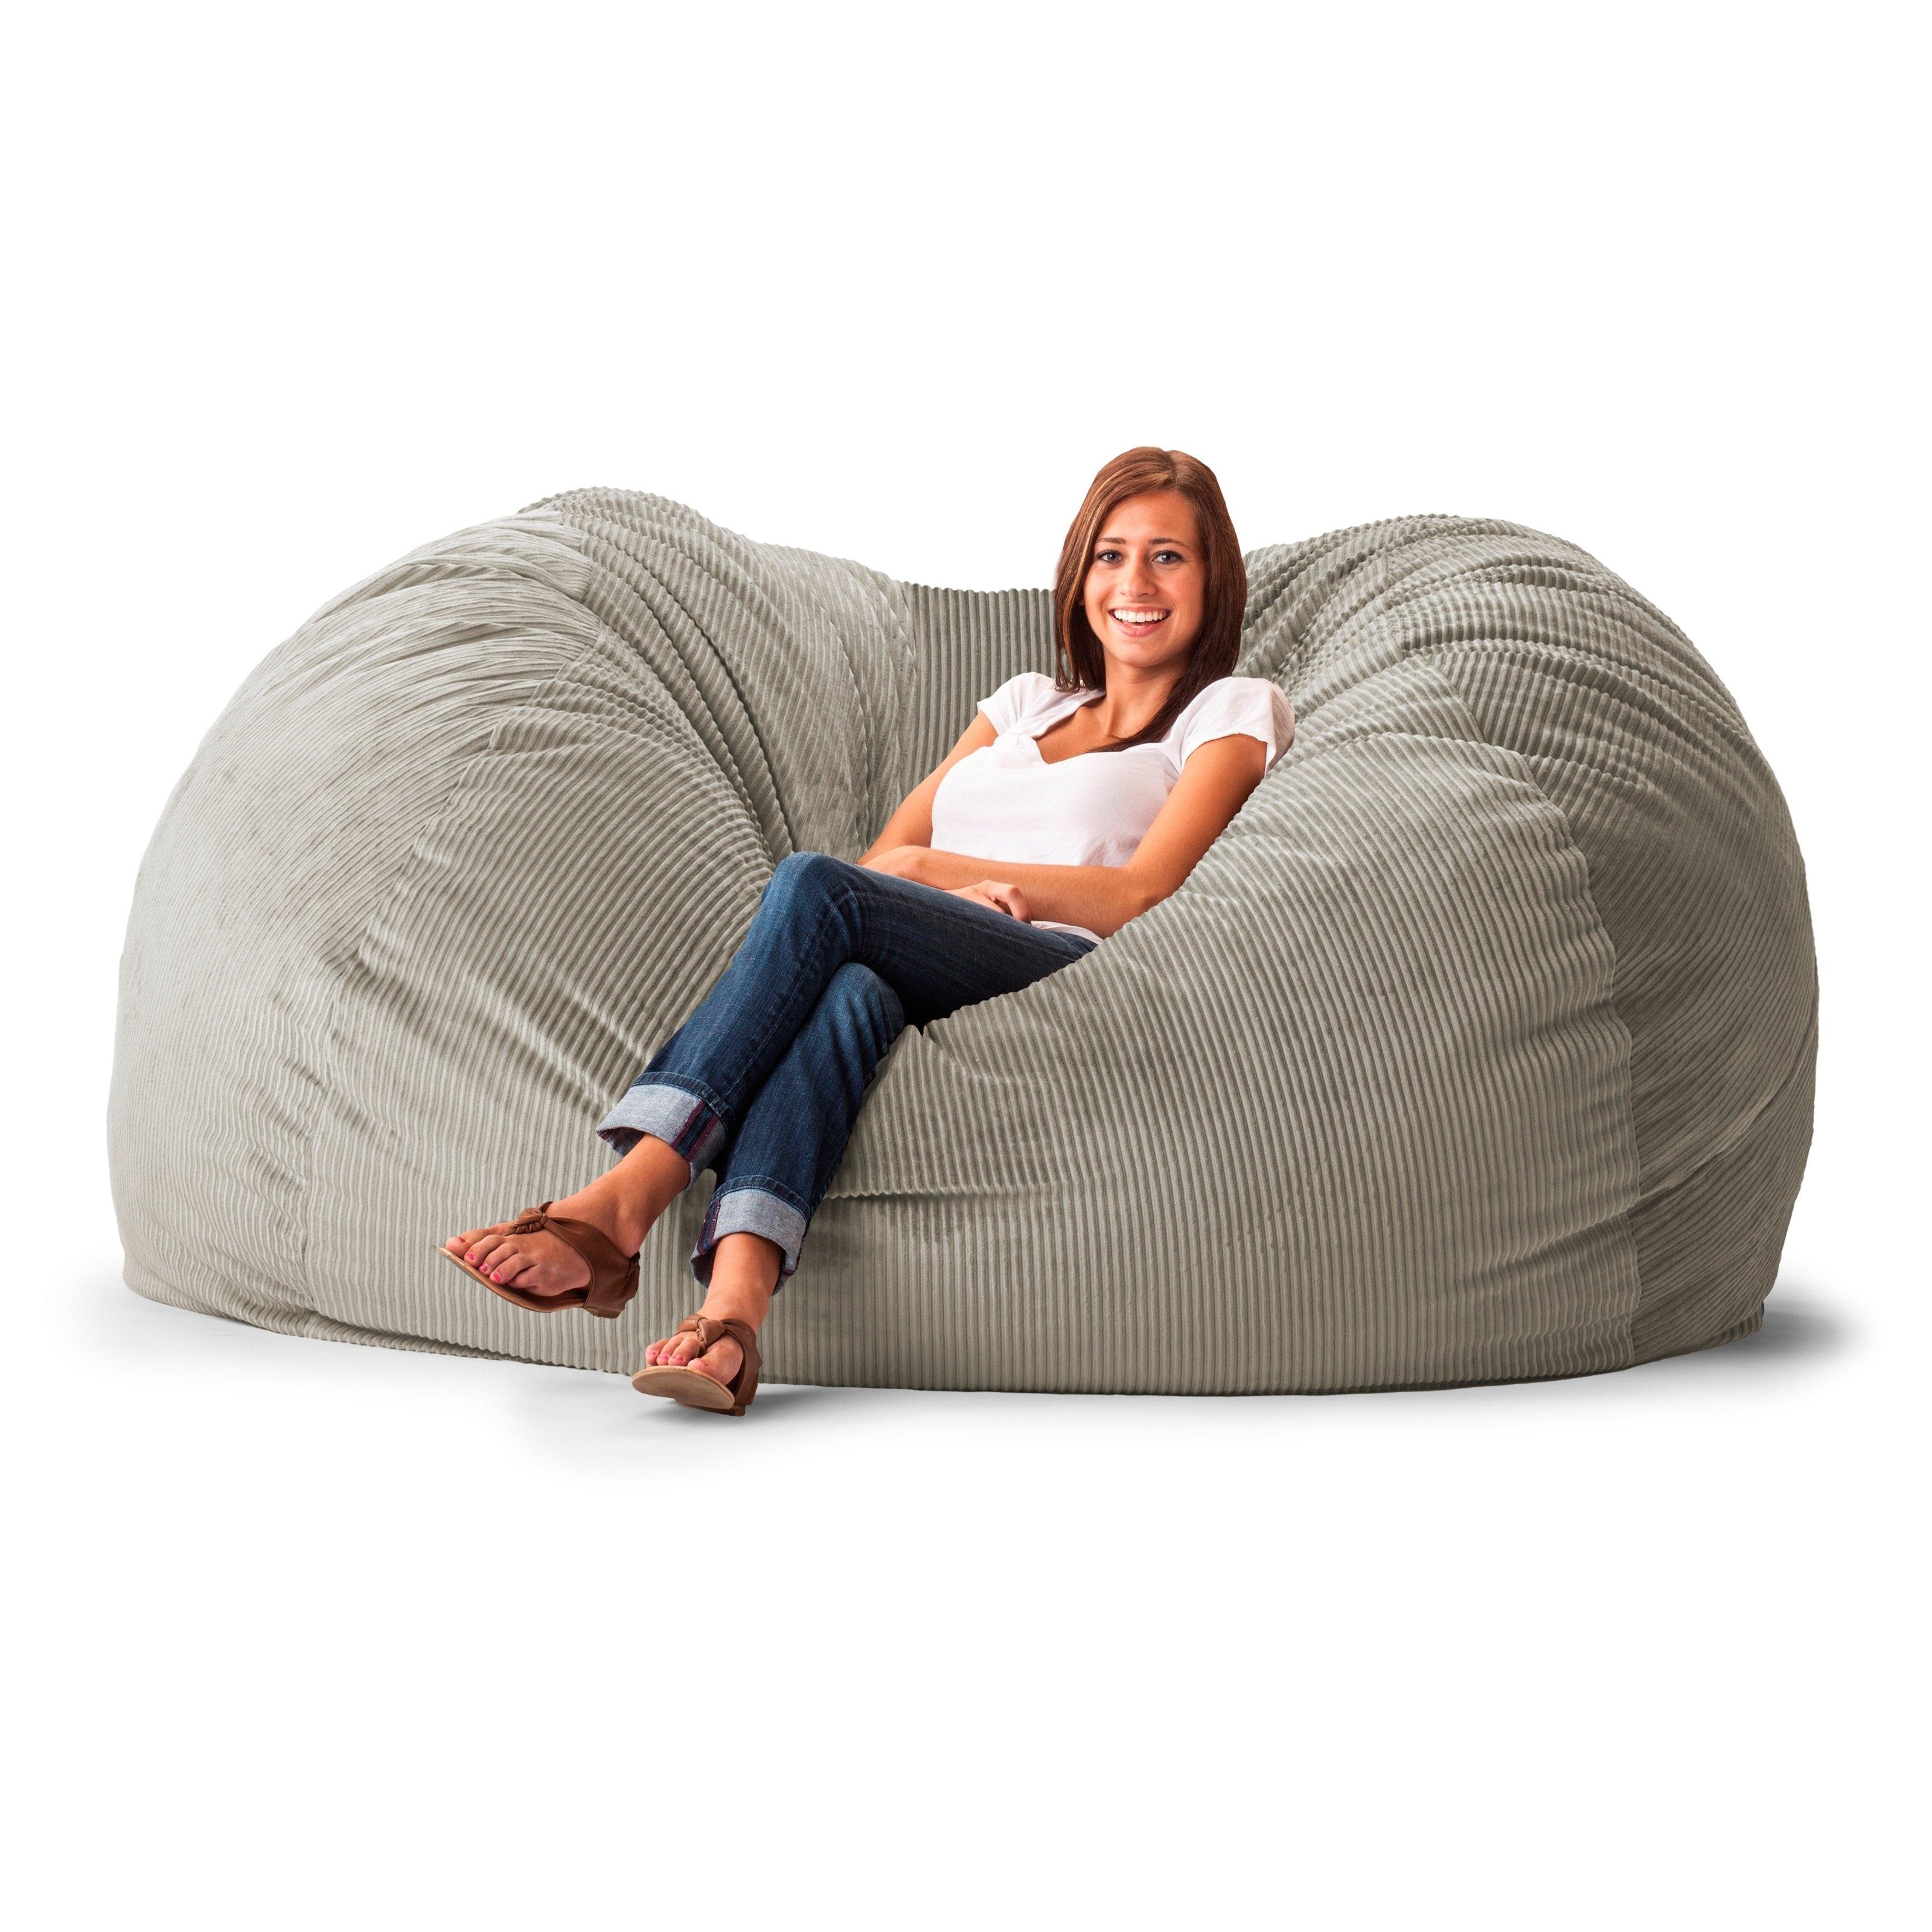 Newest Bean Bag Sofas With Comfort Bean Bag Sofa – Florist H&g (View 17 of 20)